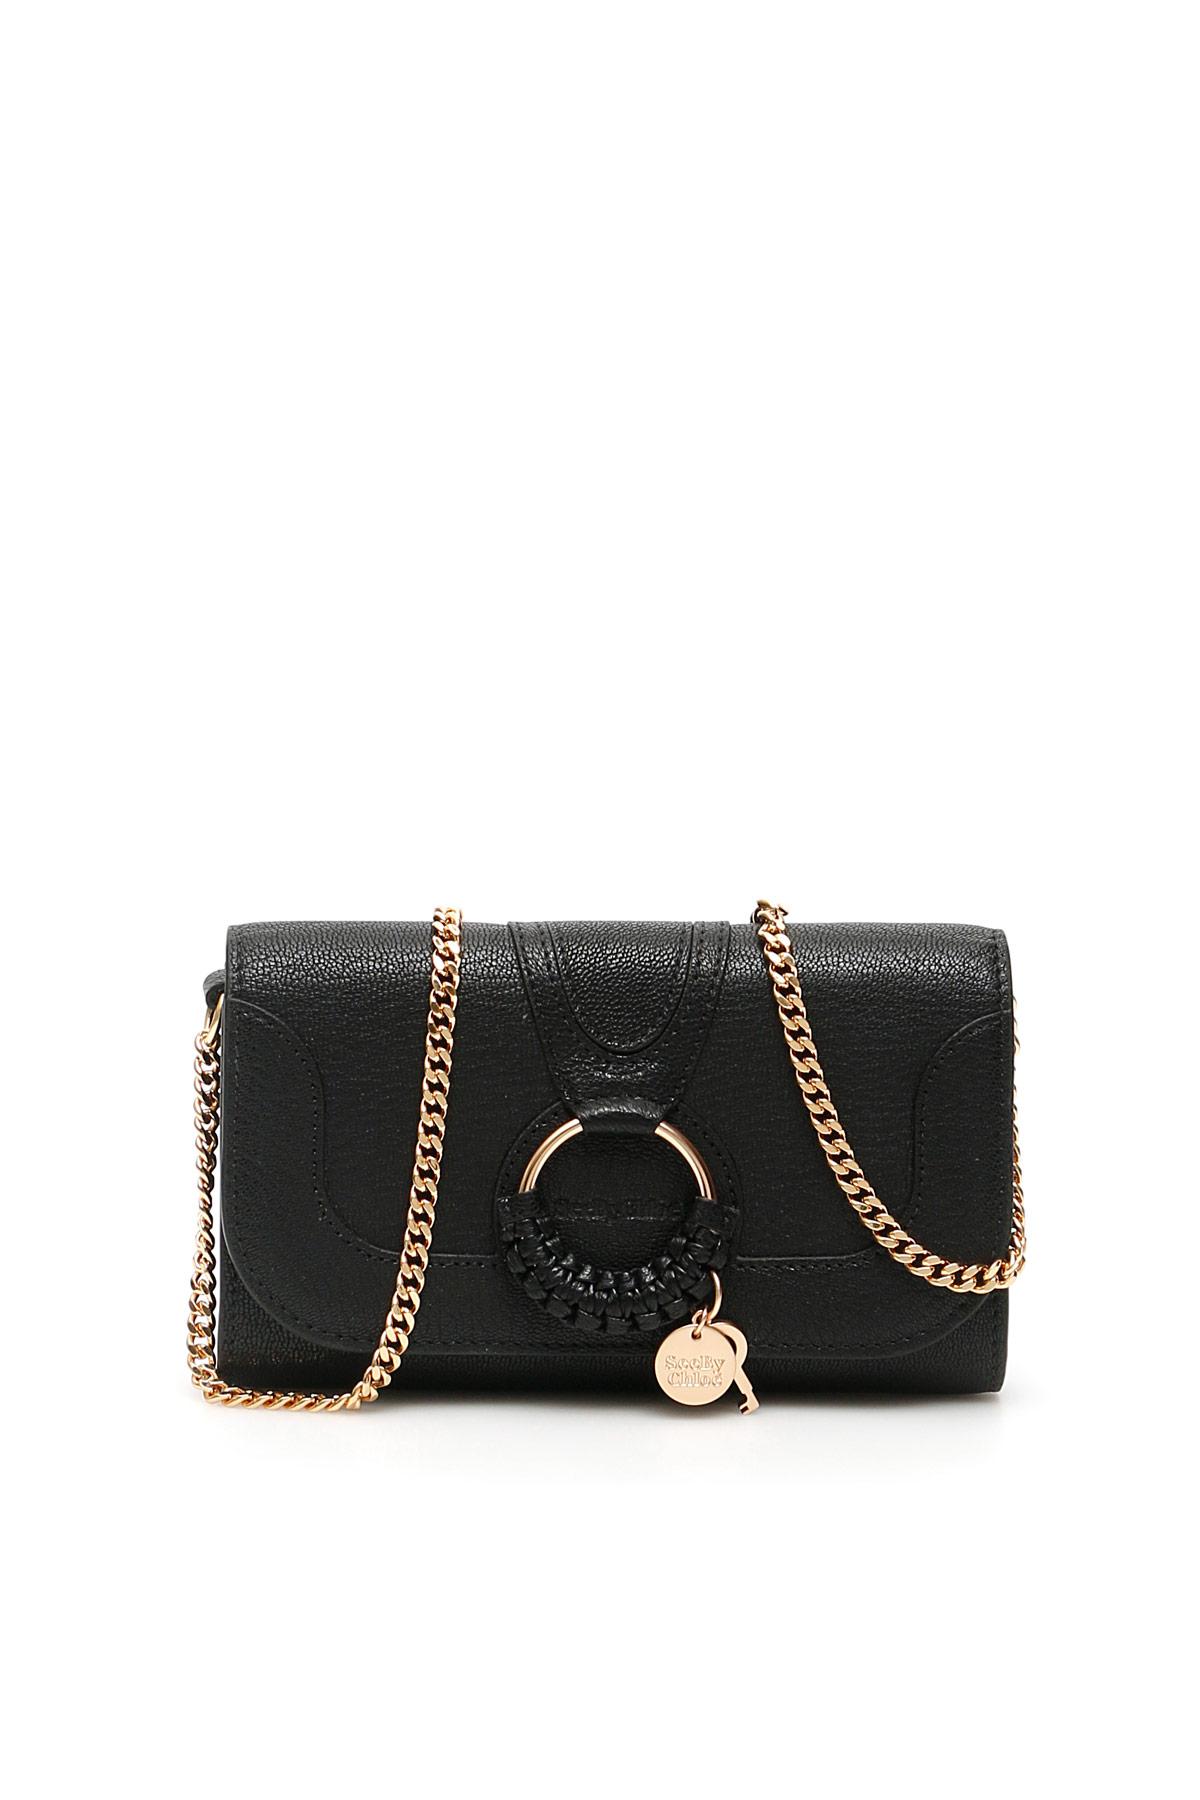 SEE BY CHLOE HANA LONG WALLET CHAIN MINI BAG OS Black Leather